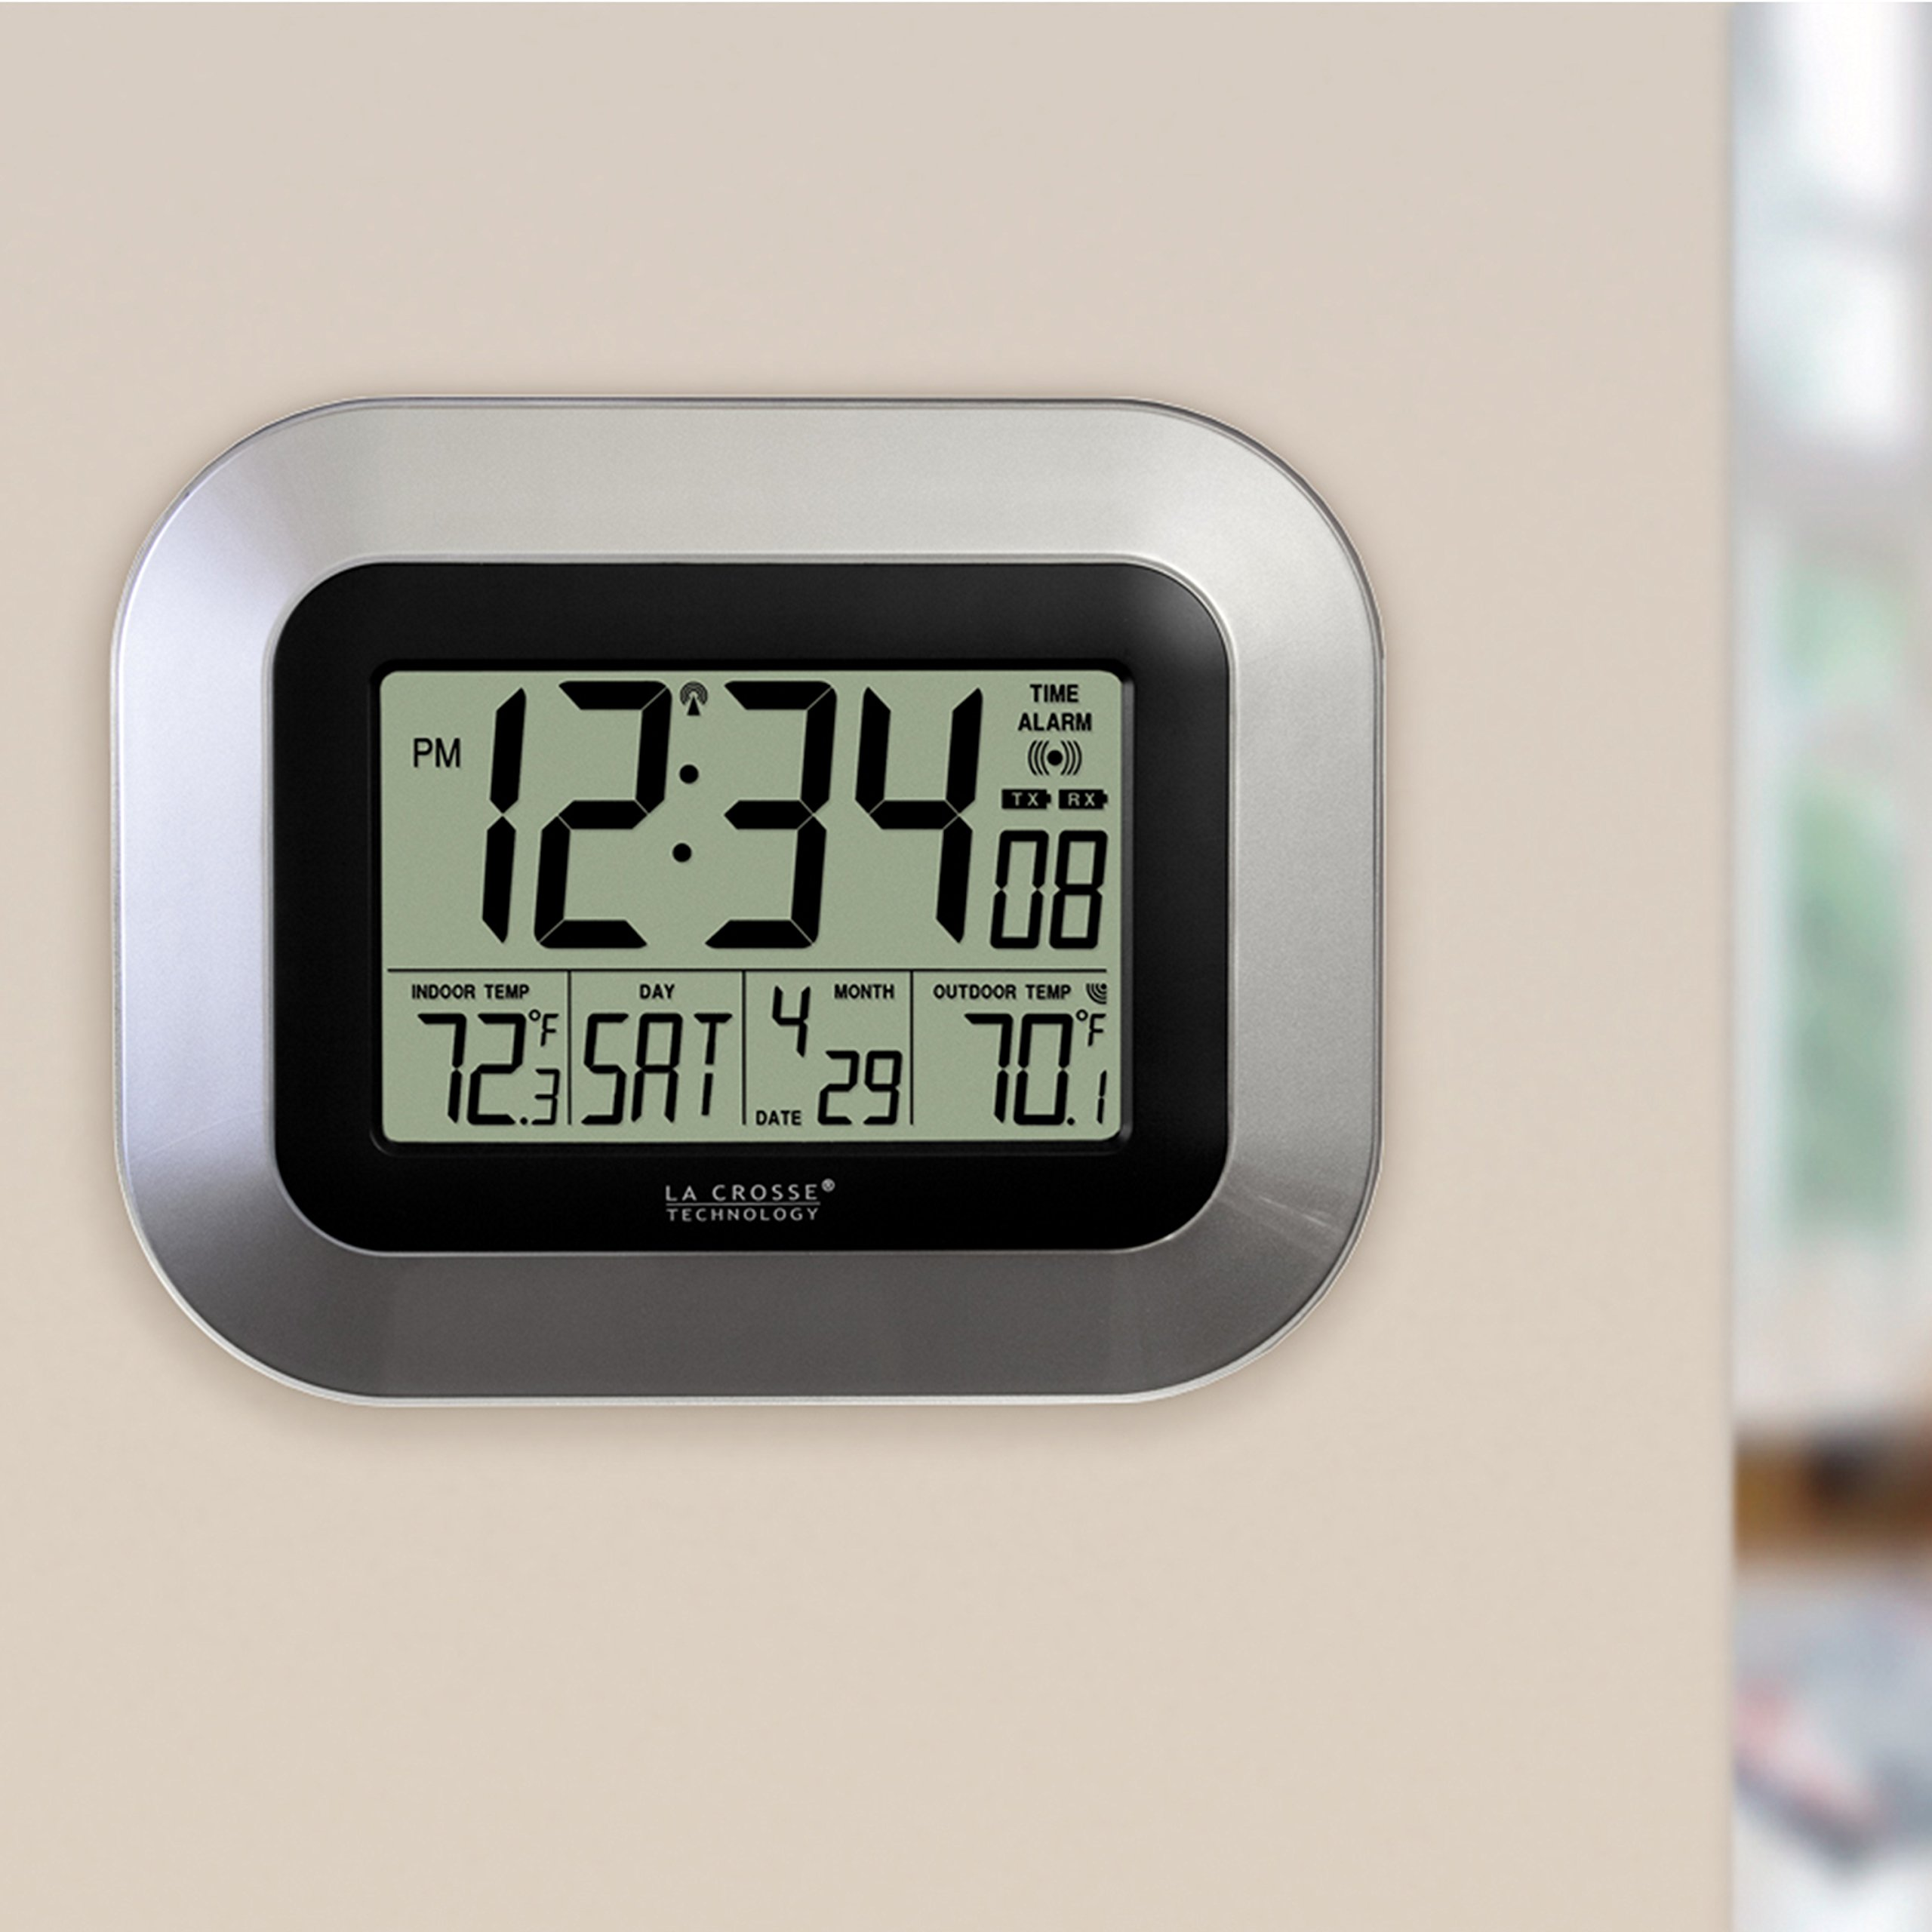 Brookstone 5 in 1 Sensor Clock | eBay